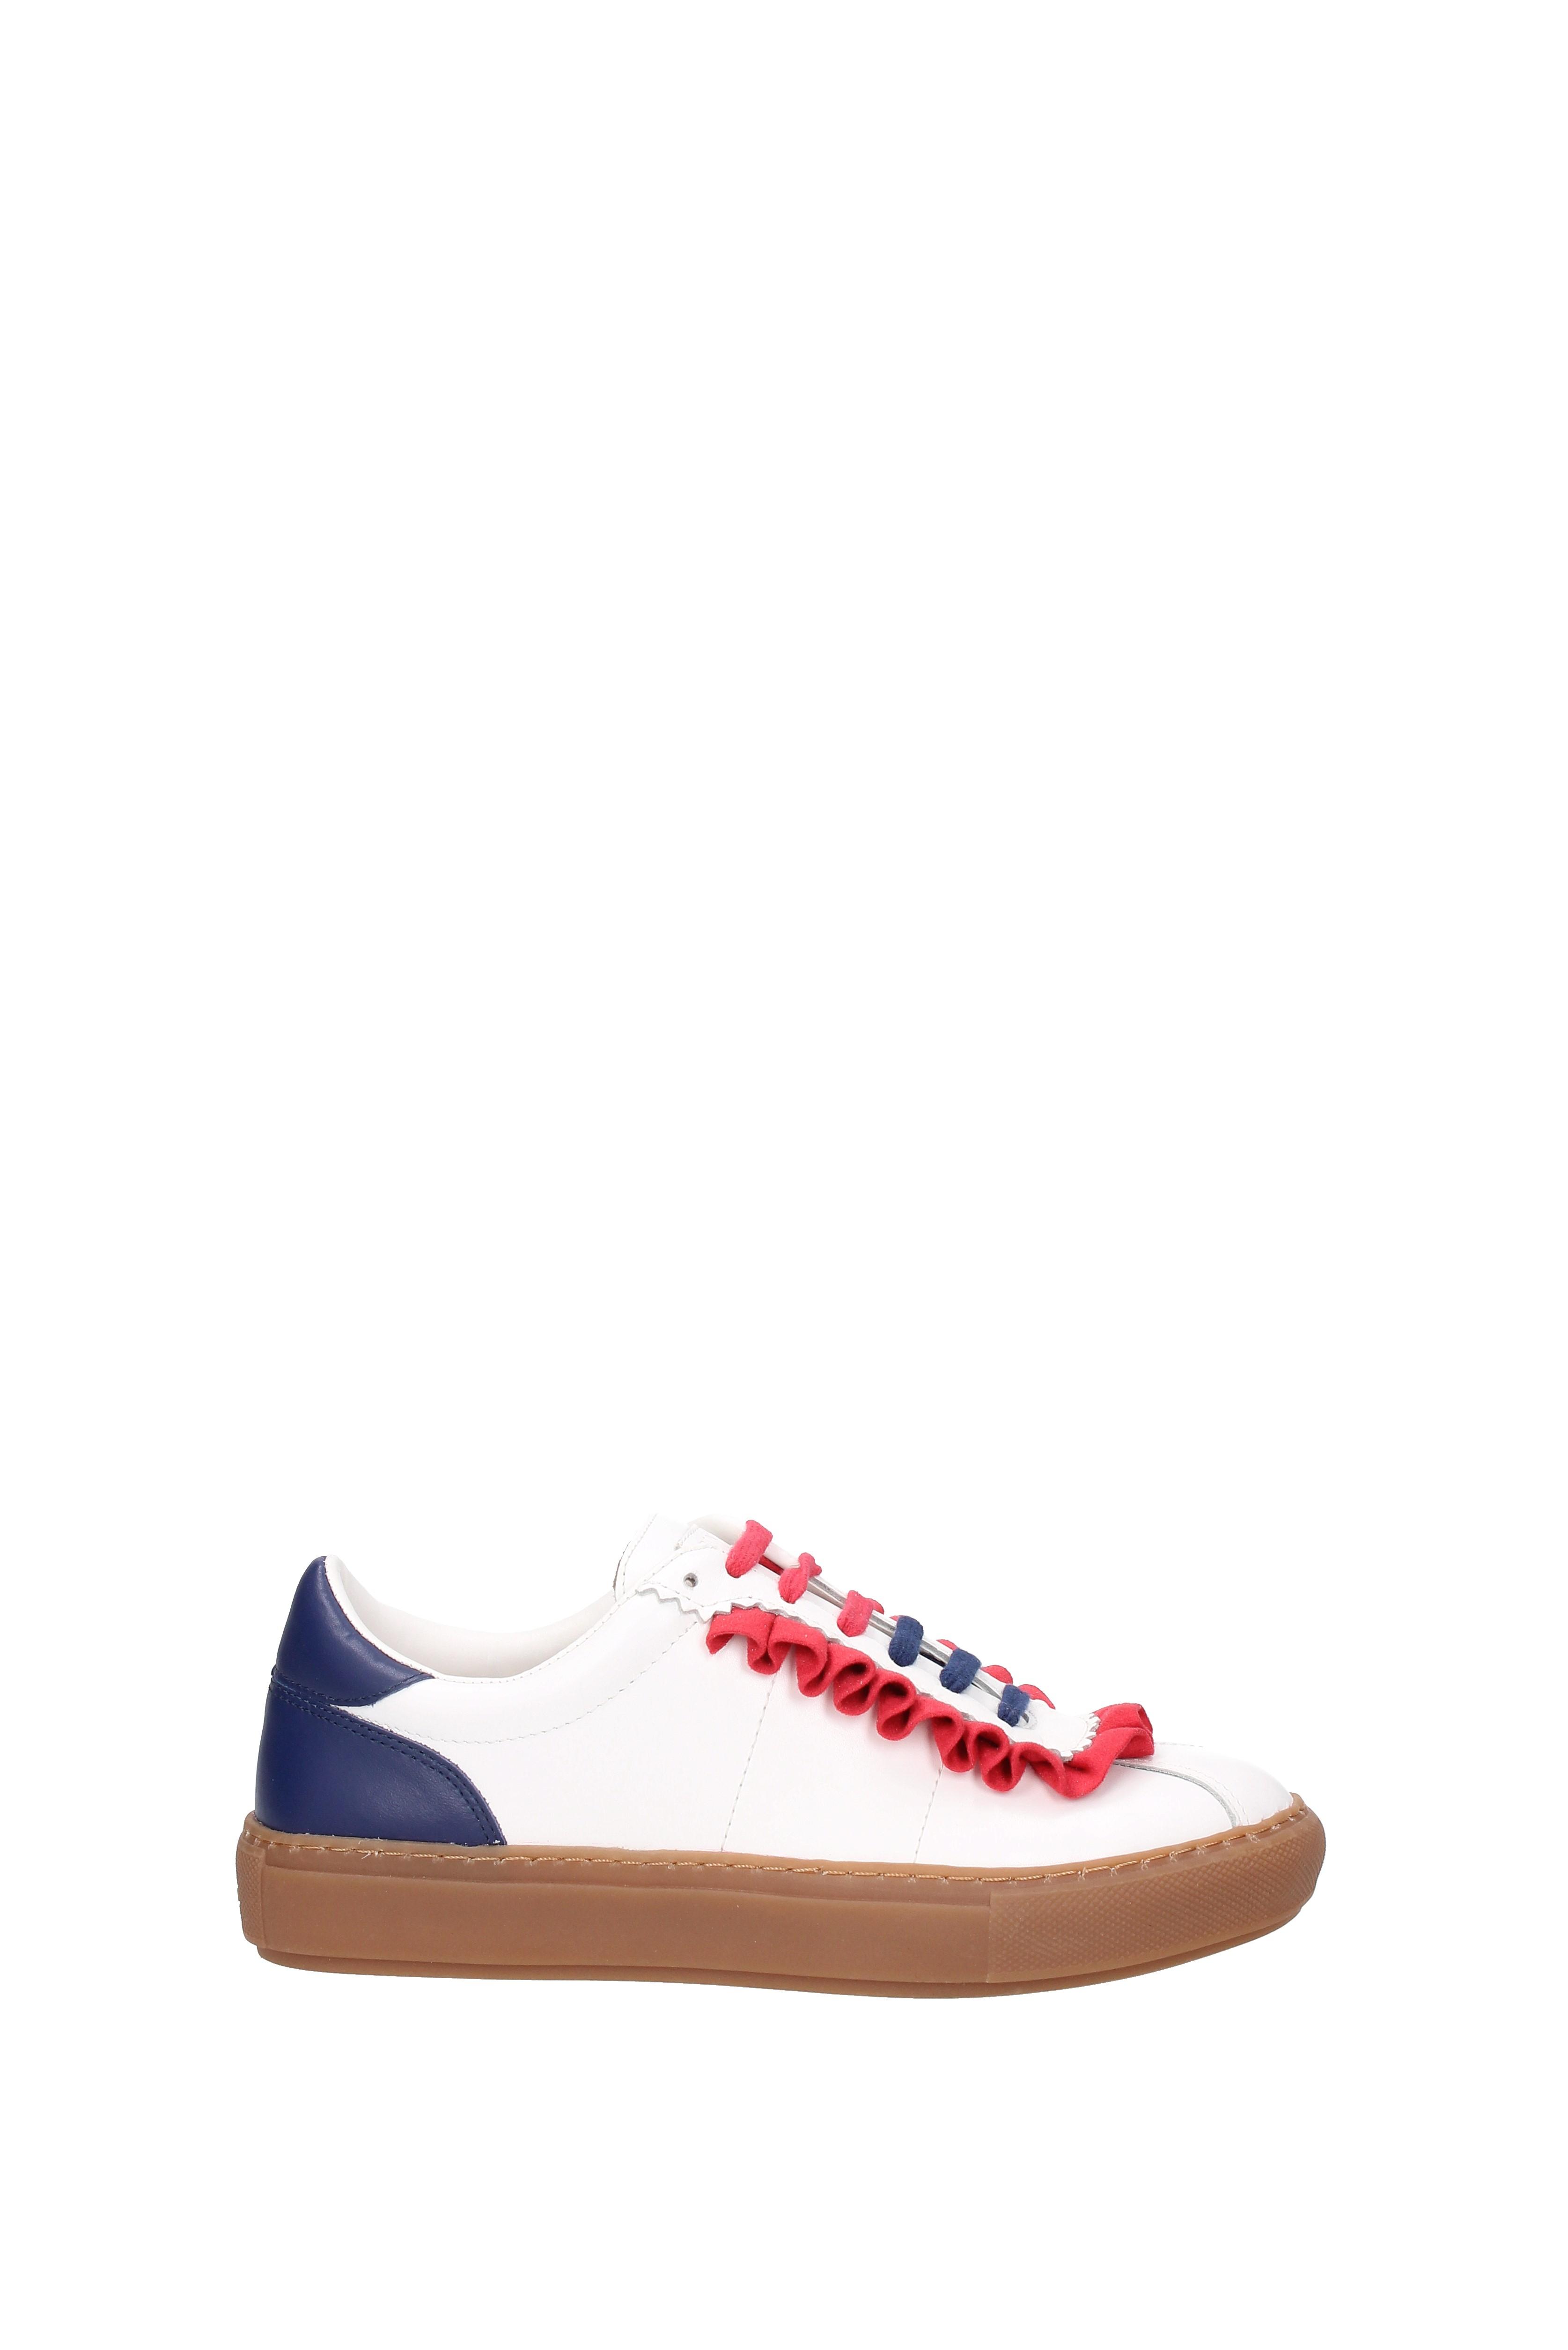 Sneakers Pinko gallese 1 Damens - Leder (1H209CY39D) (1H209CY39D) Leder 2abc86